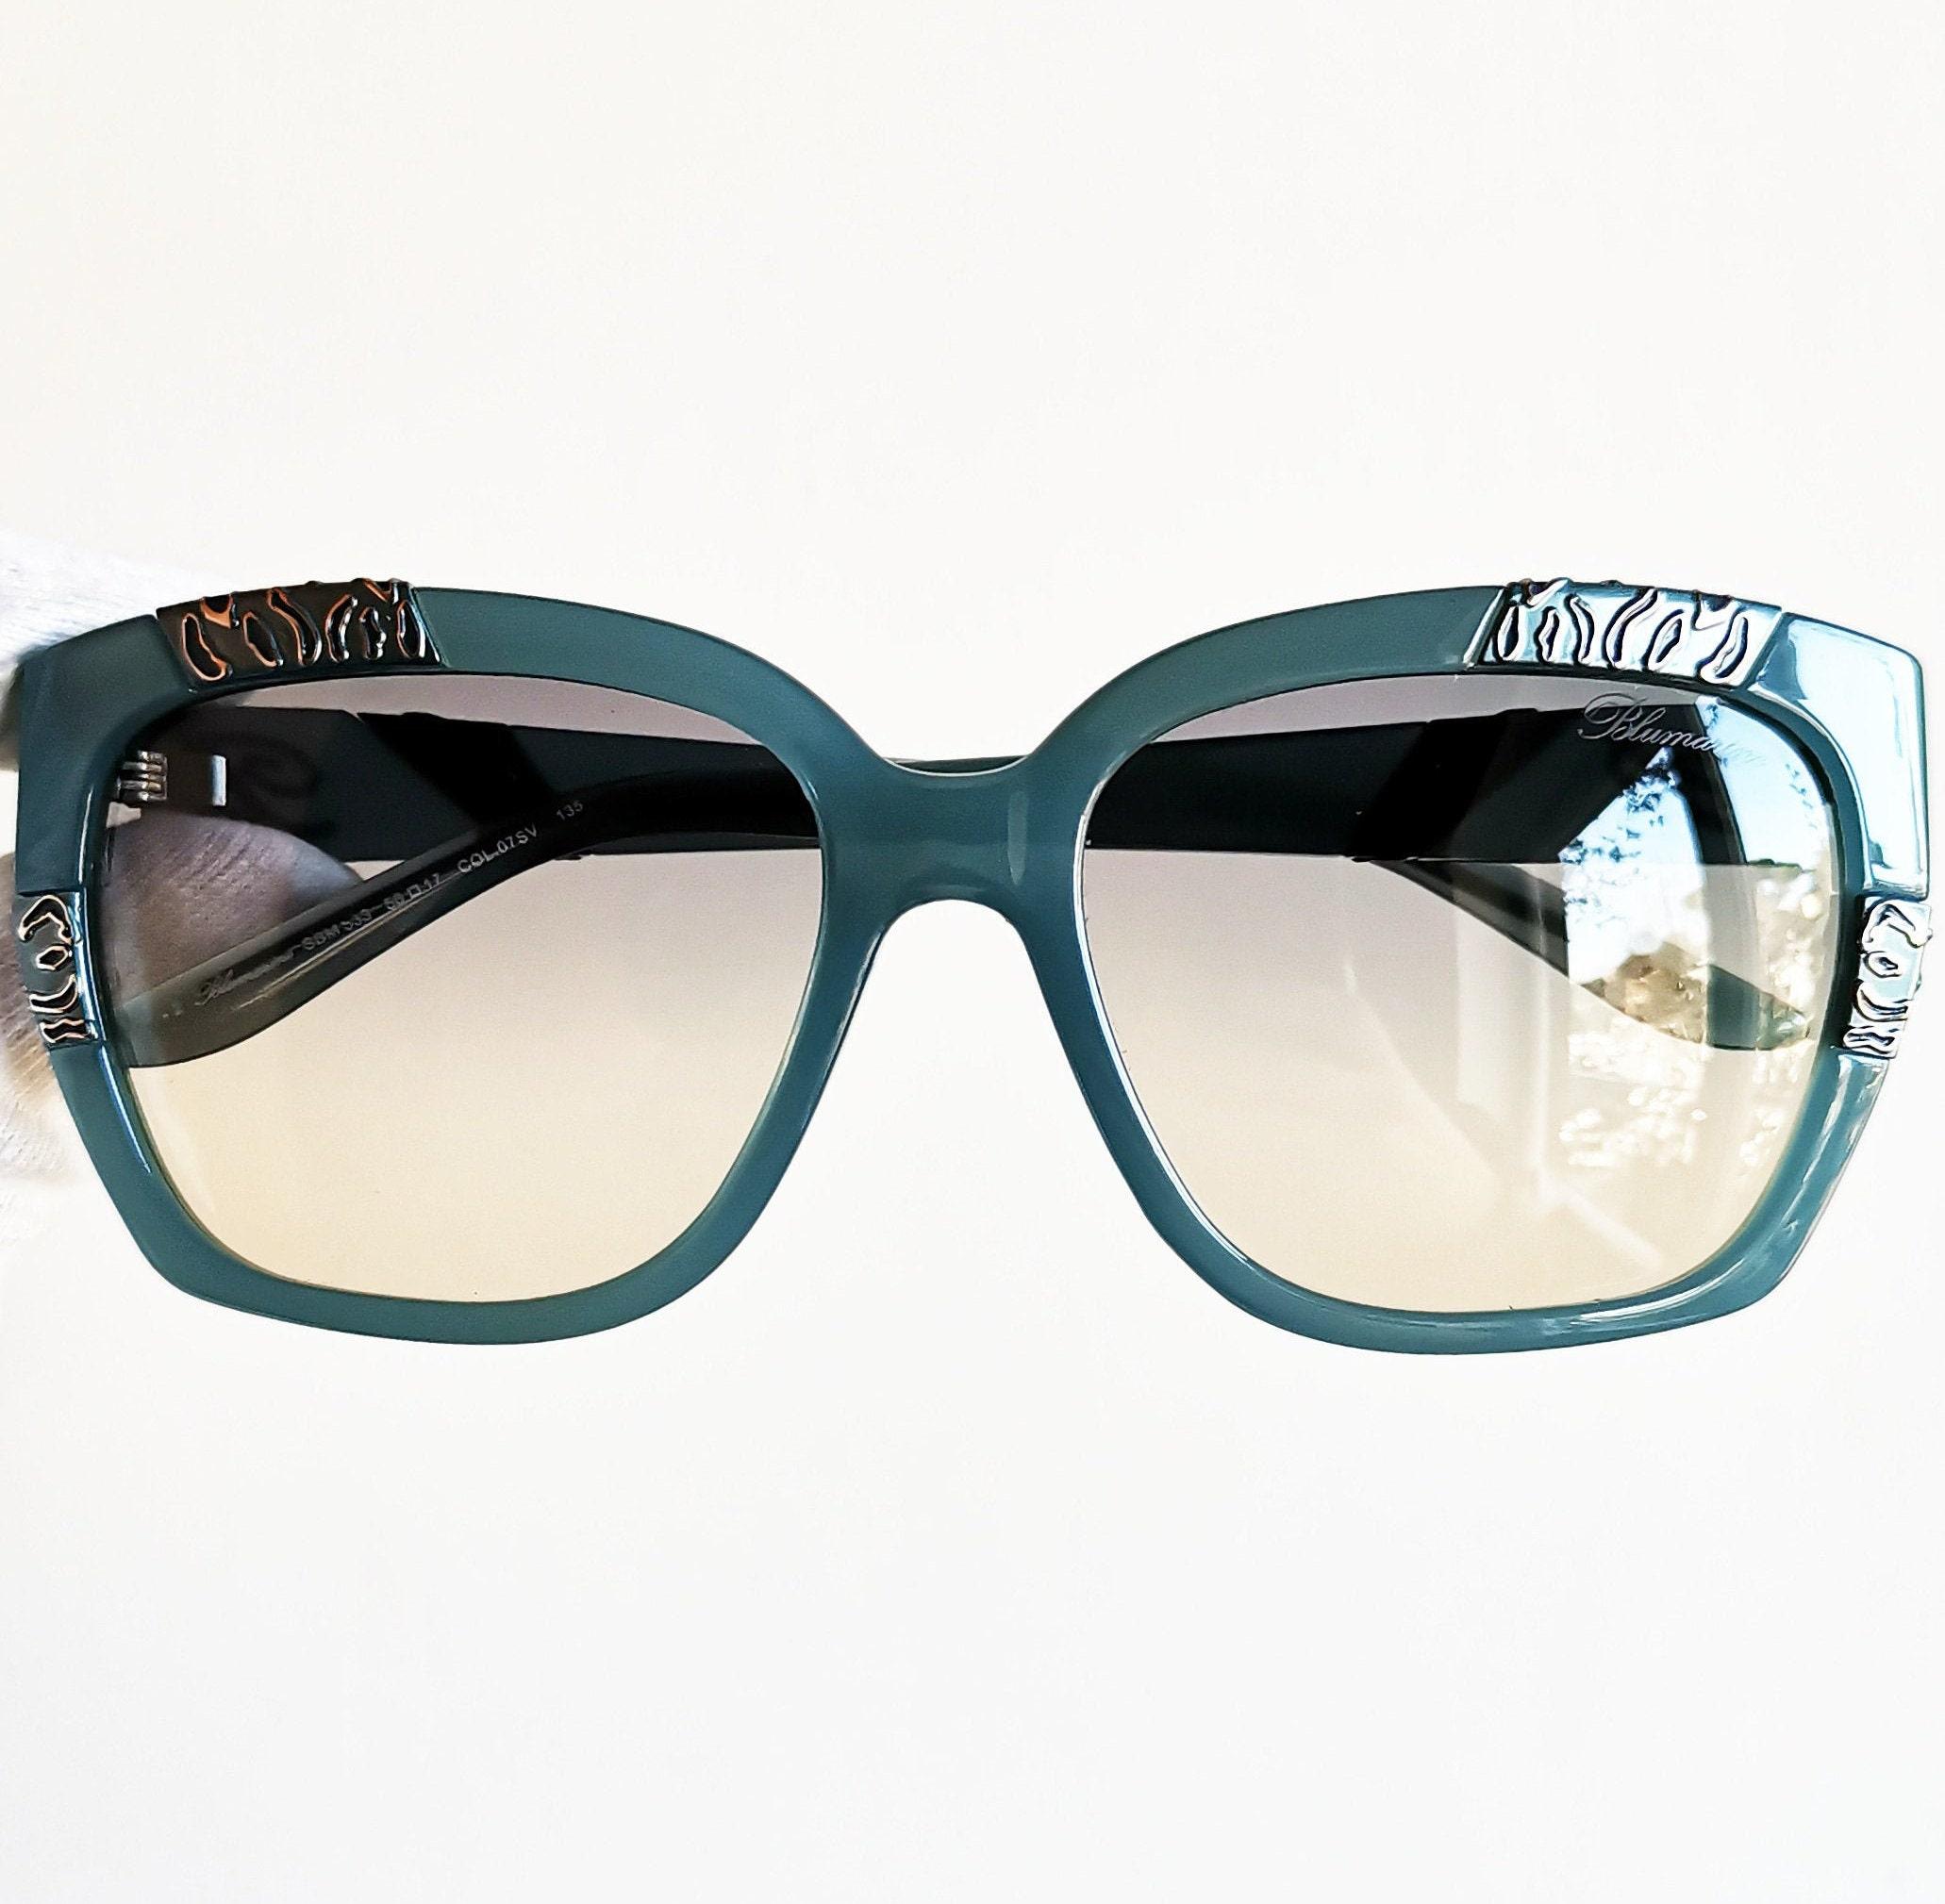 BLUMARINE BM 96053 B95 Mask Shield Sunglasses